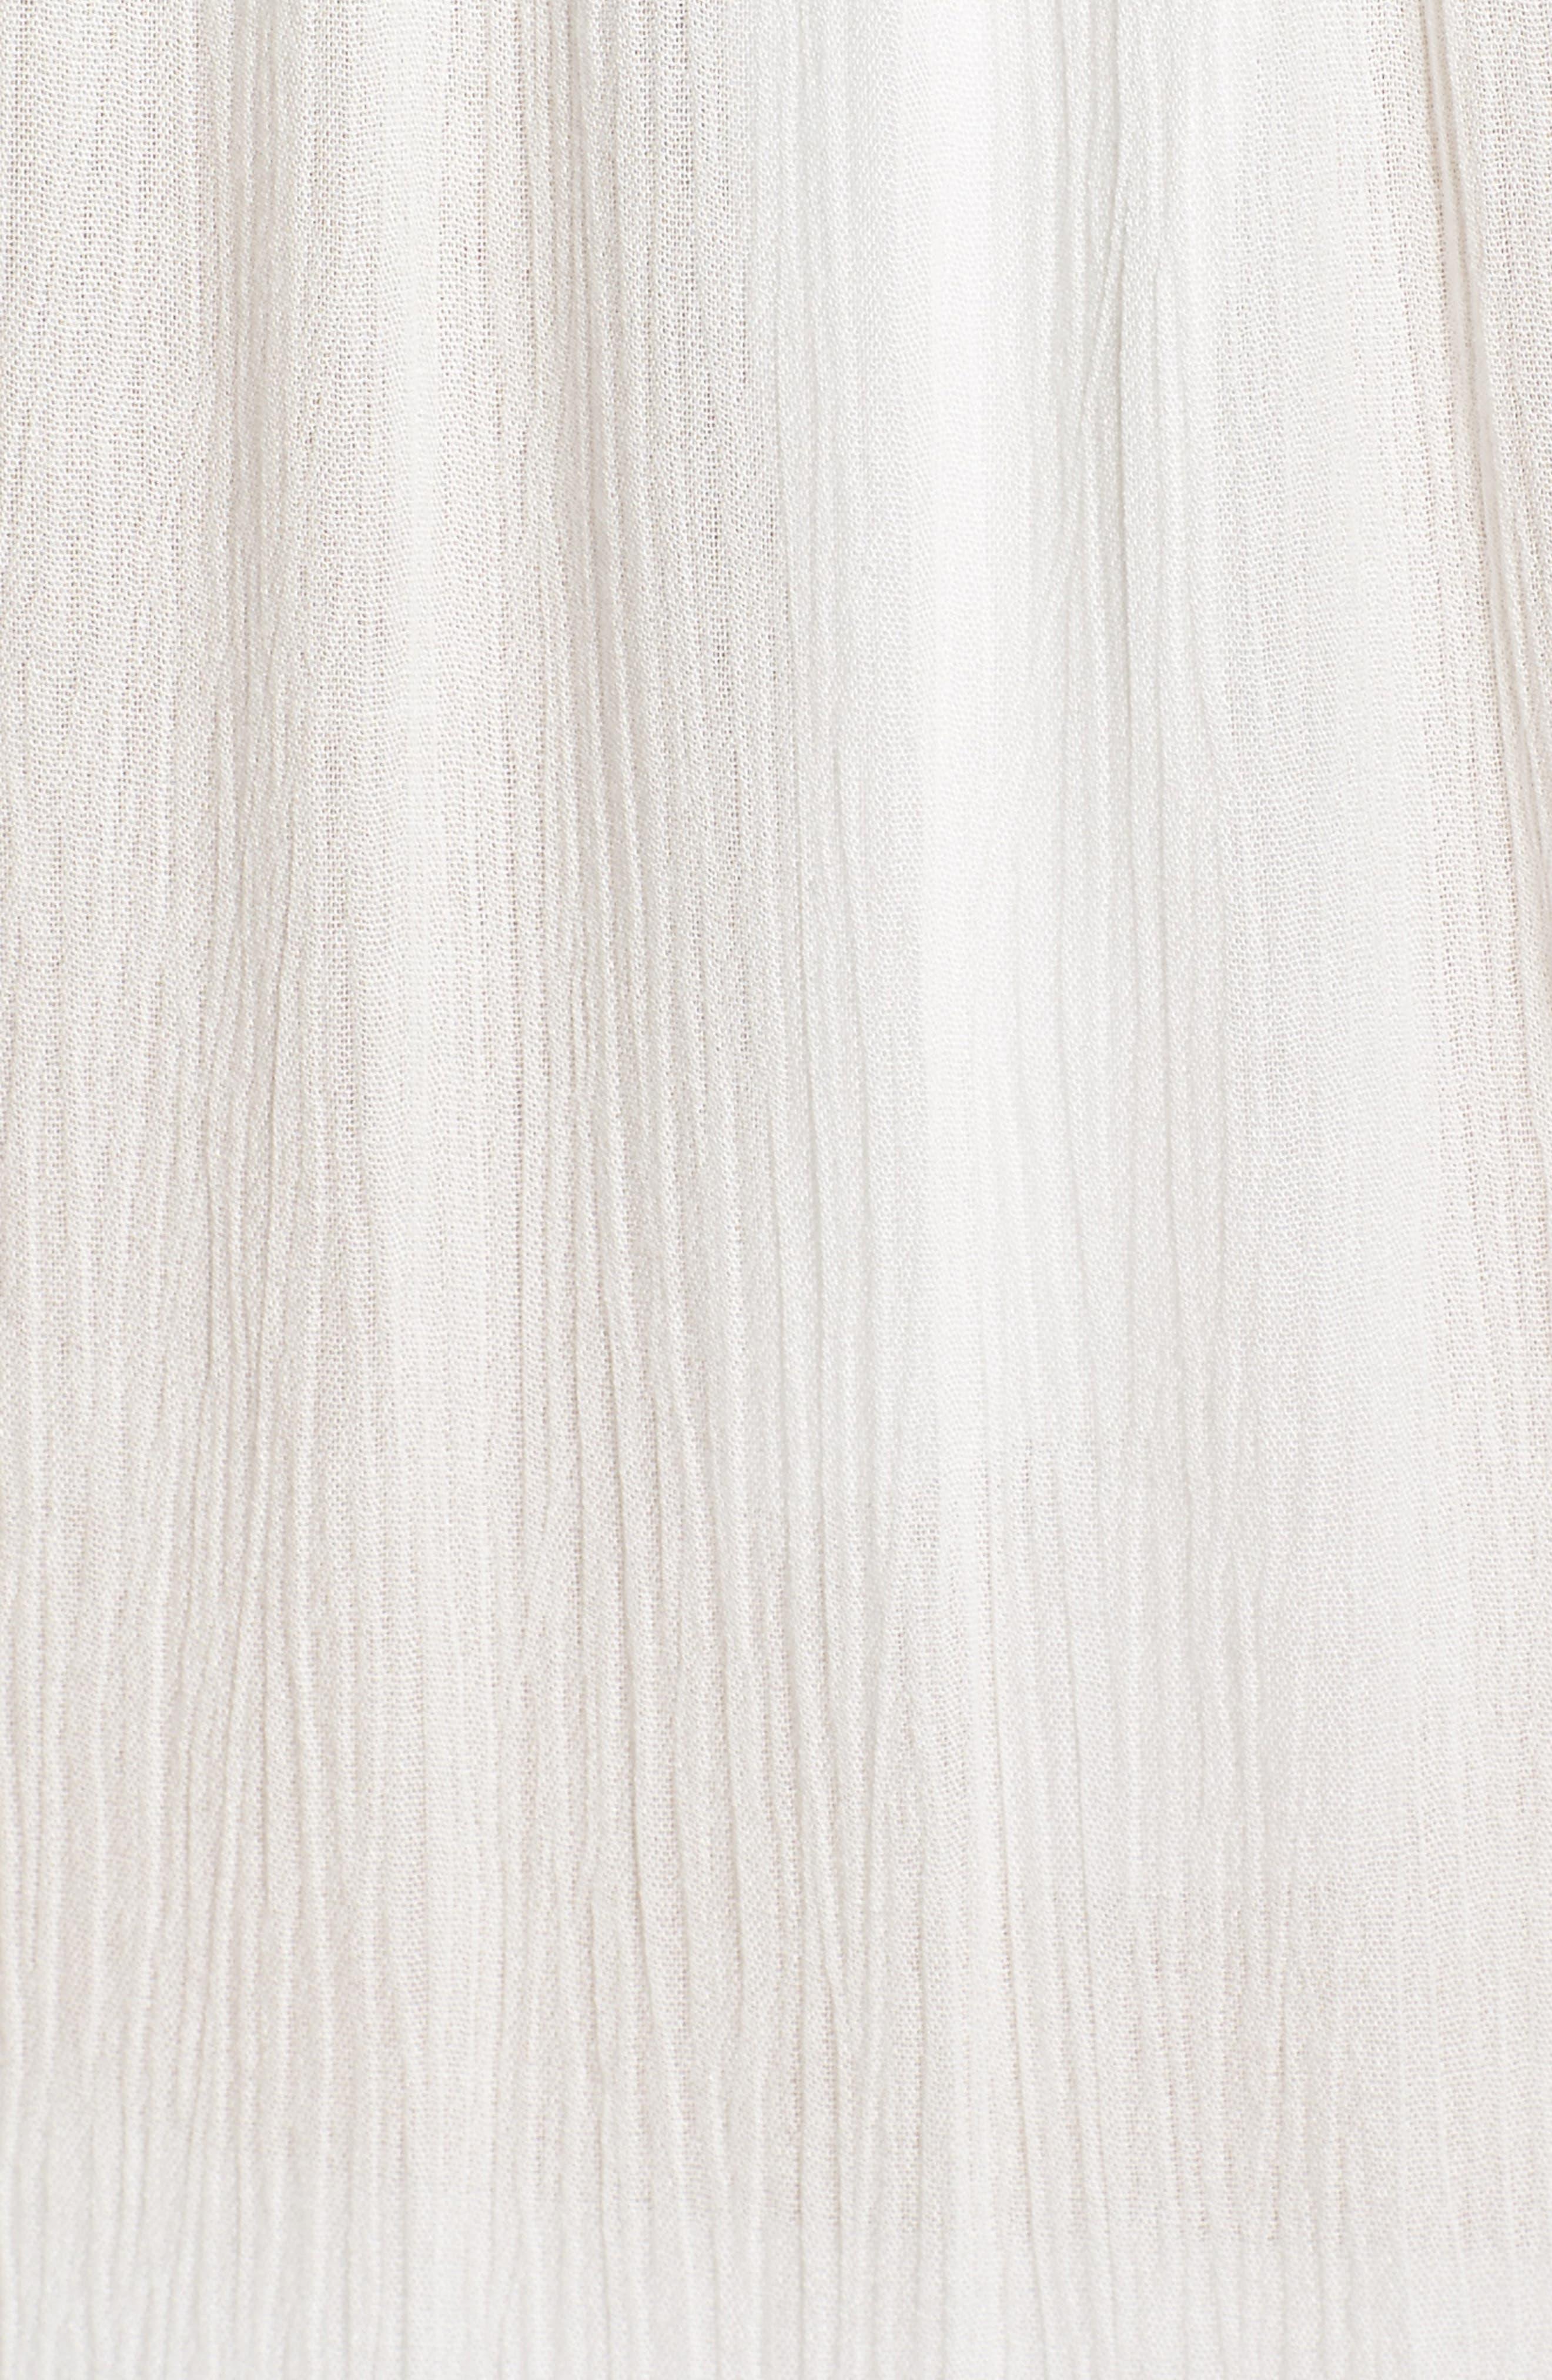 Cover-Up Dress,                             Alternate thumbnail 5, color,                             White